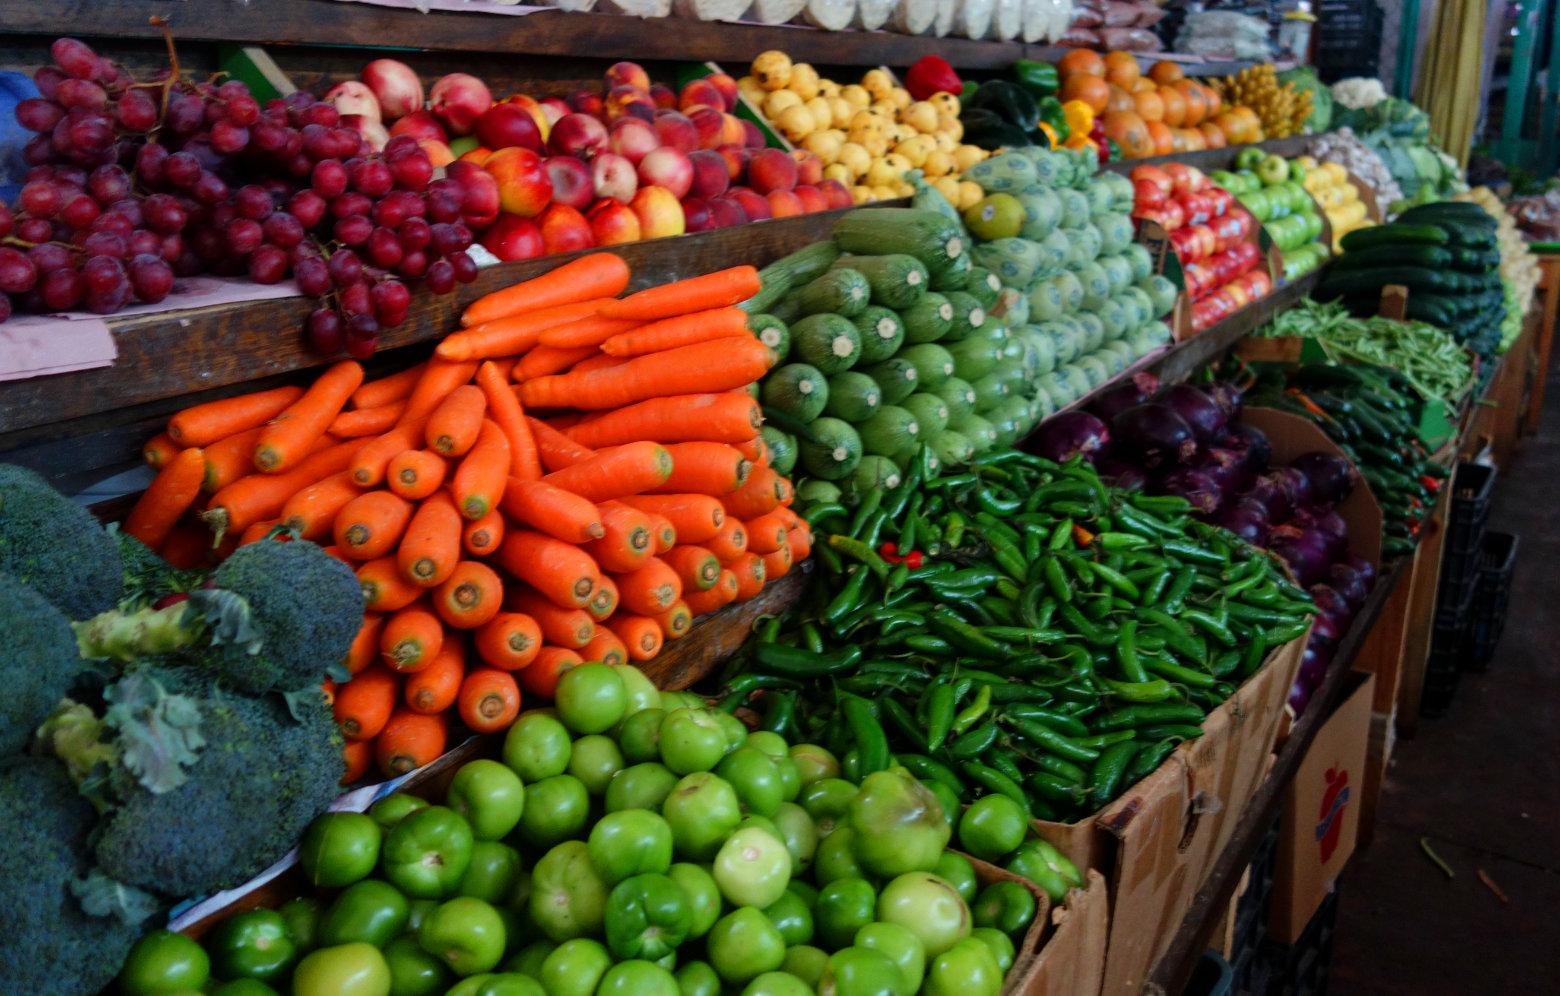 Mexiko Markt Gemüse Obst